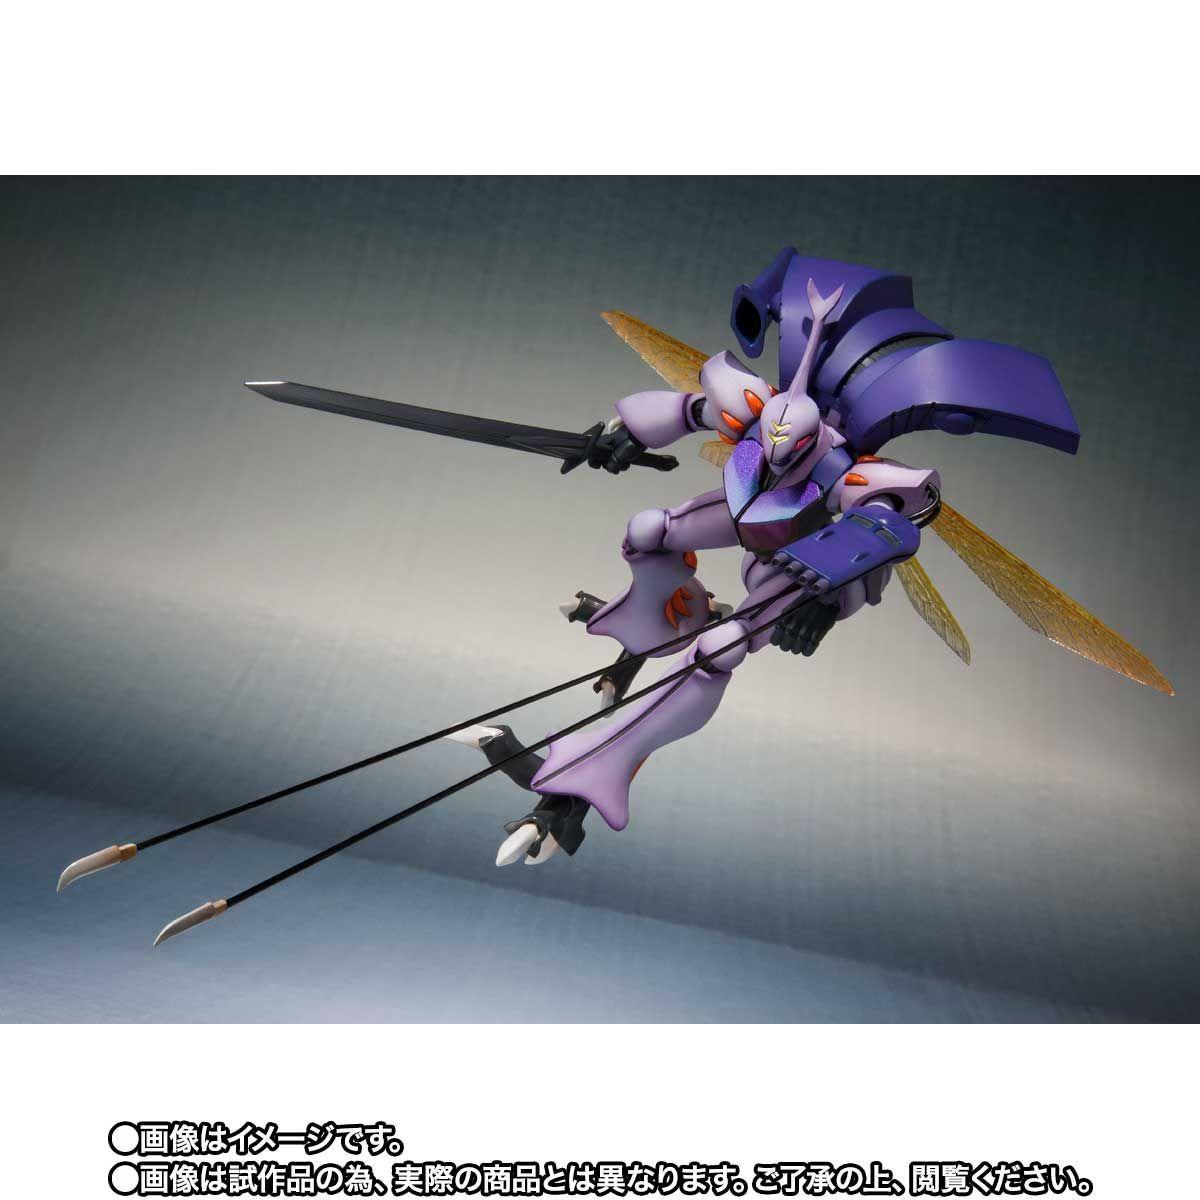 ROBOT魂 ダンバイン SHADOW FINISH11